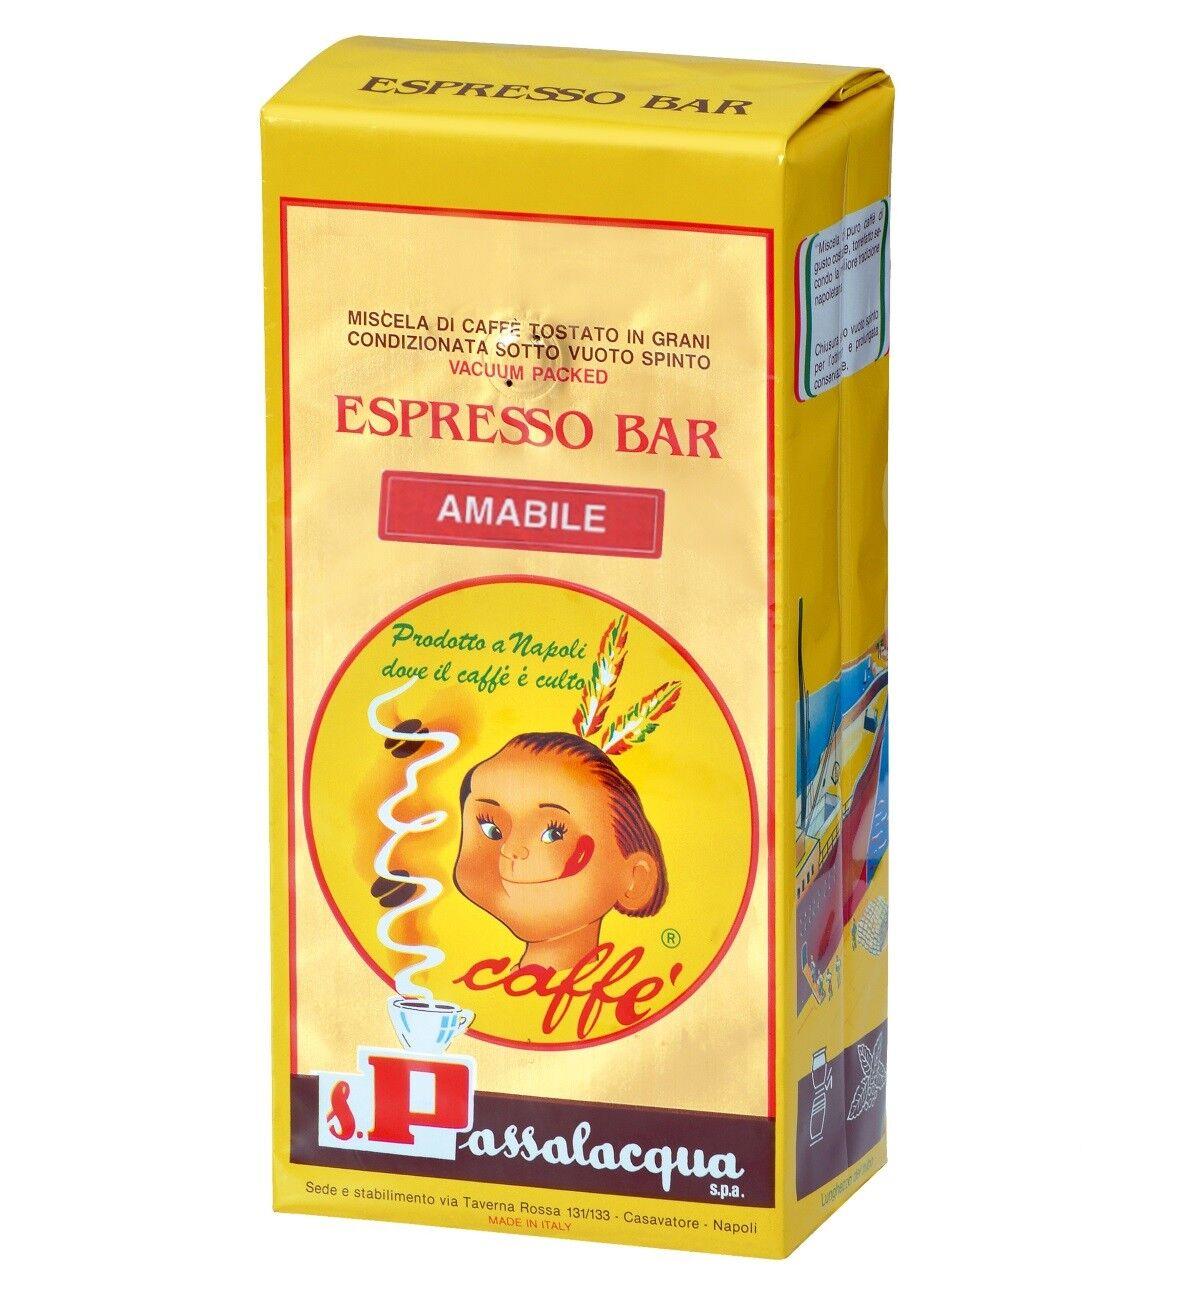 PASSALACQUA Amabile 6 X 1 KG Bohnen im Beutel